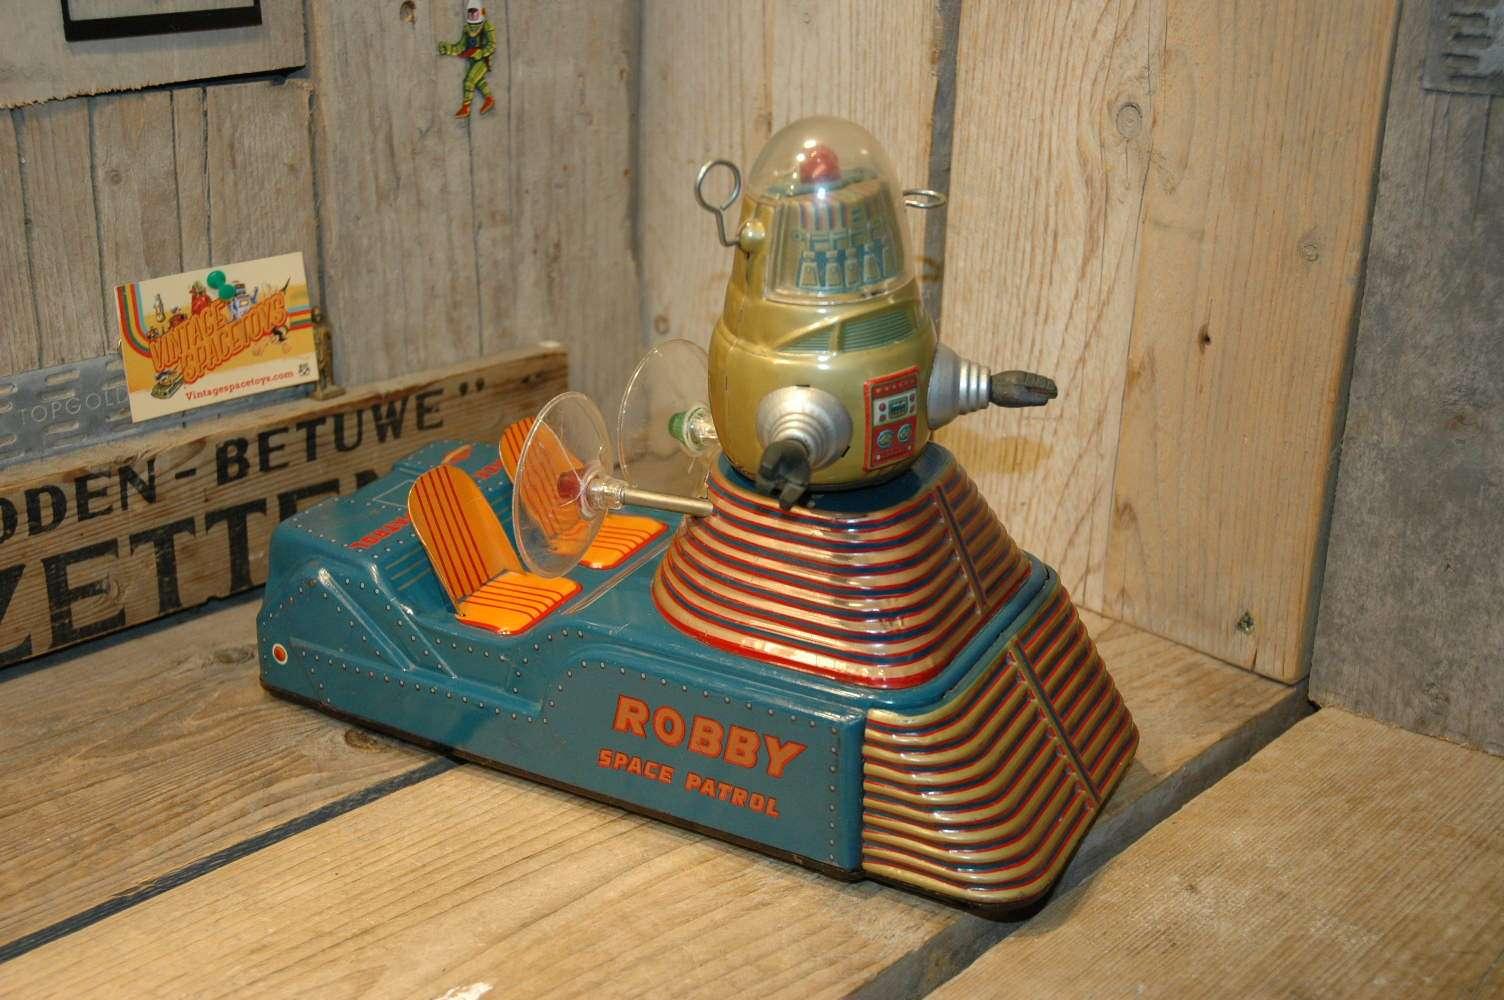 Nomura - Robby Space Patrol